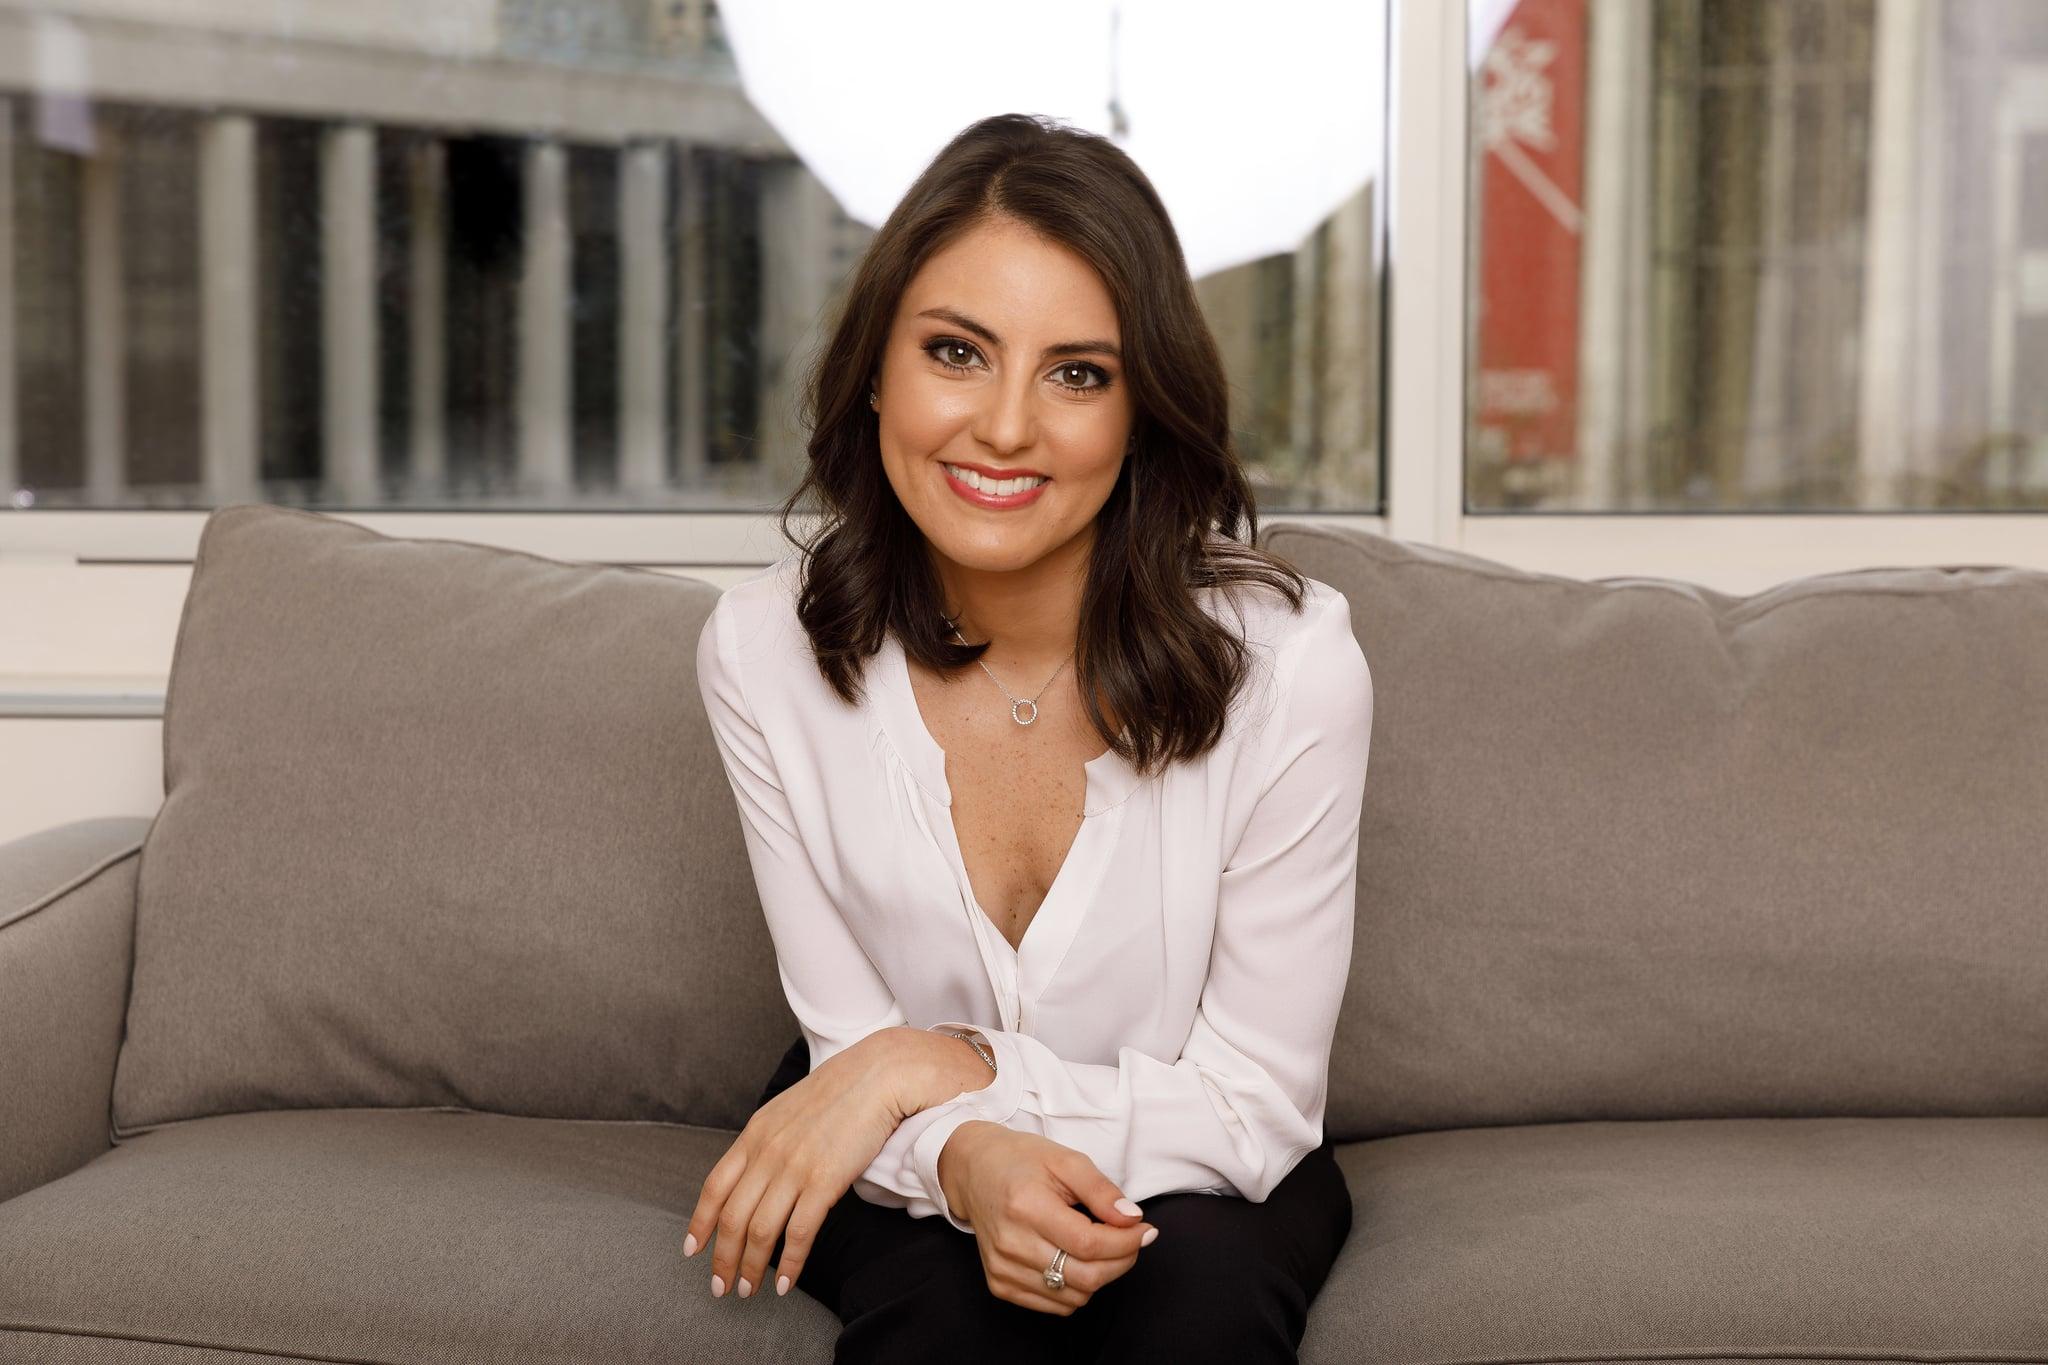 Daniela Pierre Bravo